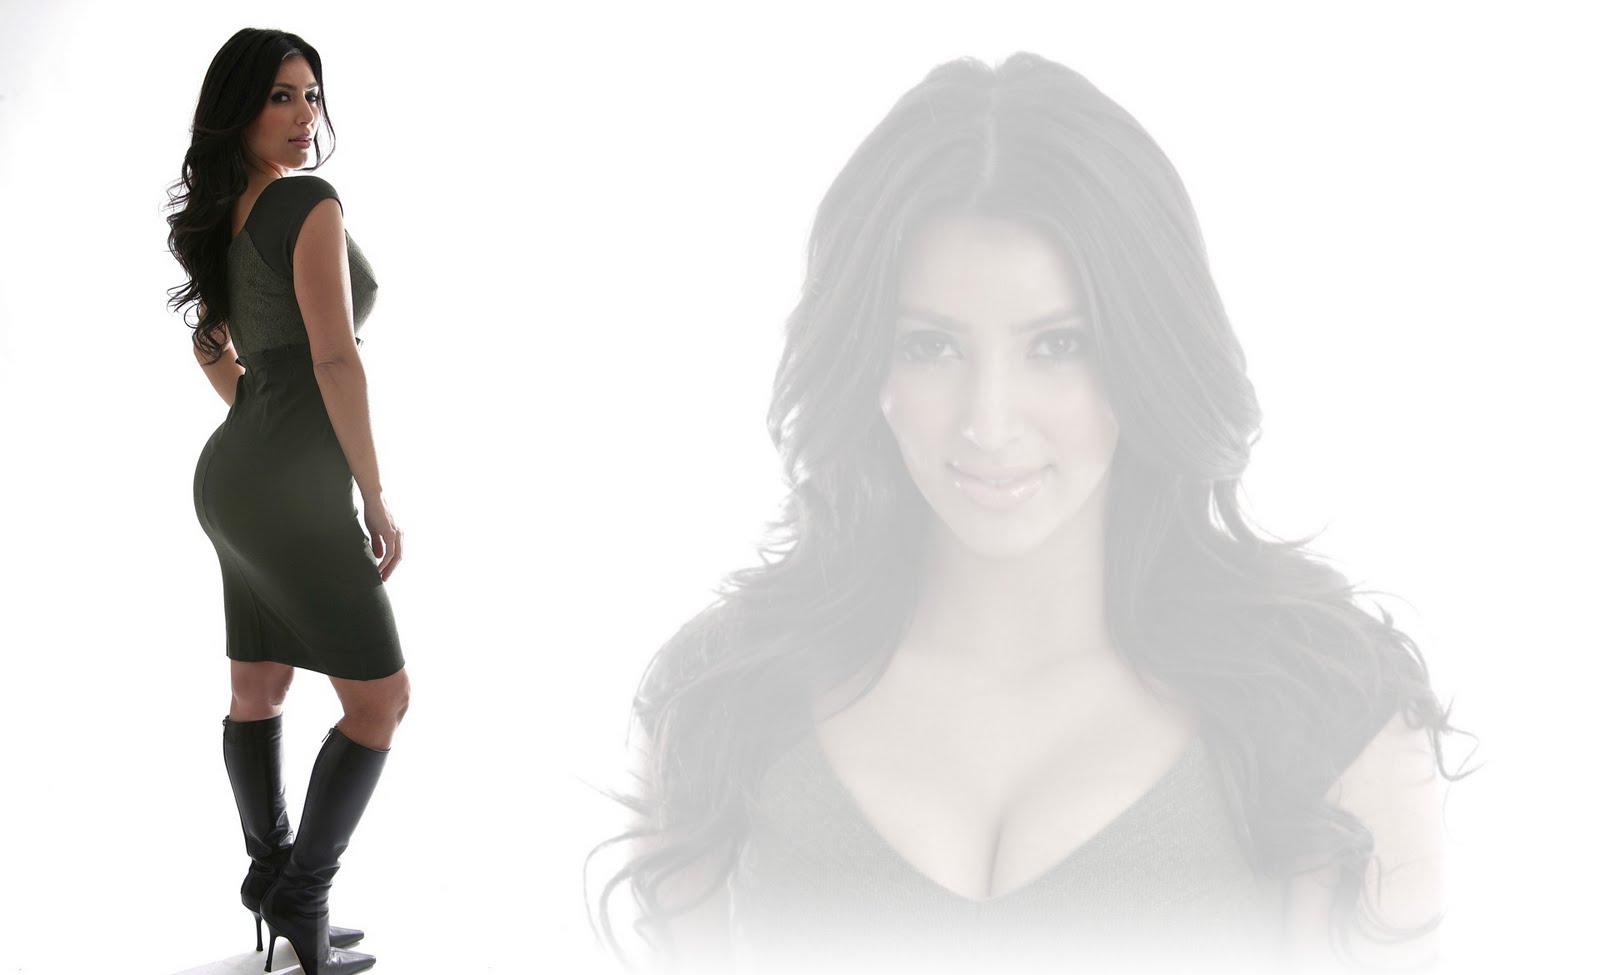 kim_kardashian_wallpapers_2011_2354578987